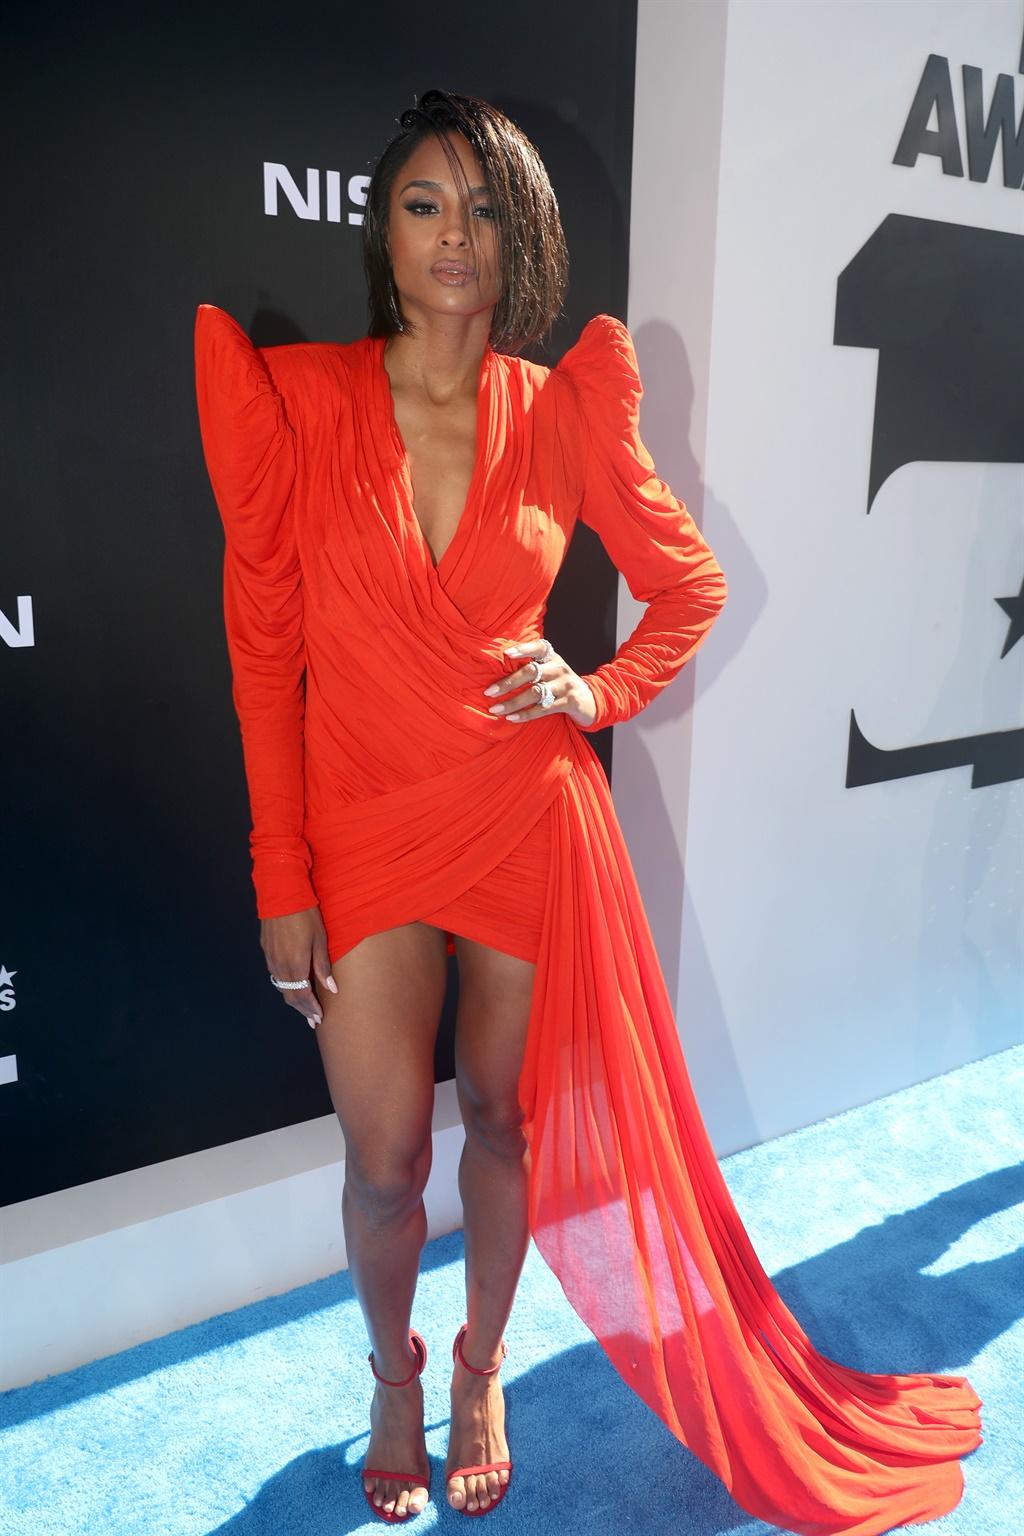 LOS ANGELES, CALIFORNIA - JUNE 23: Ciara attends t